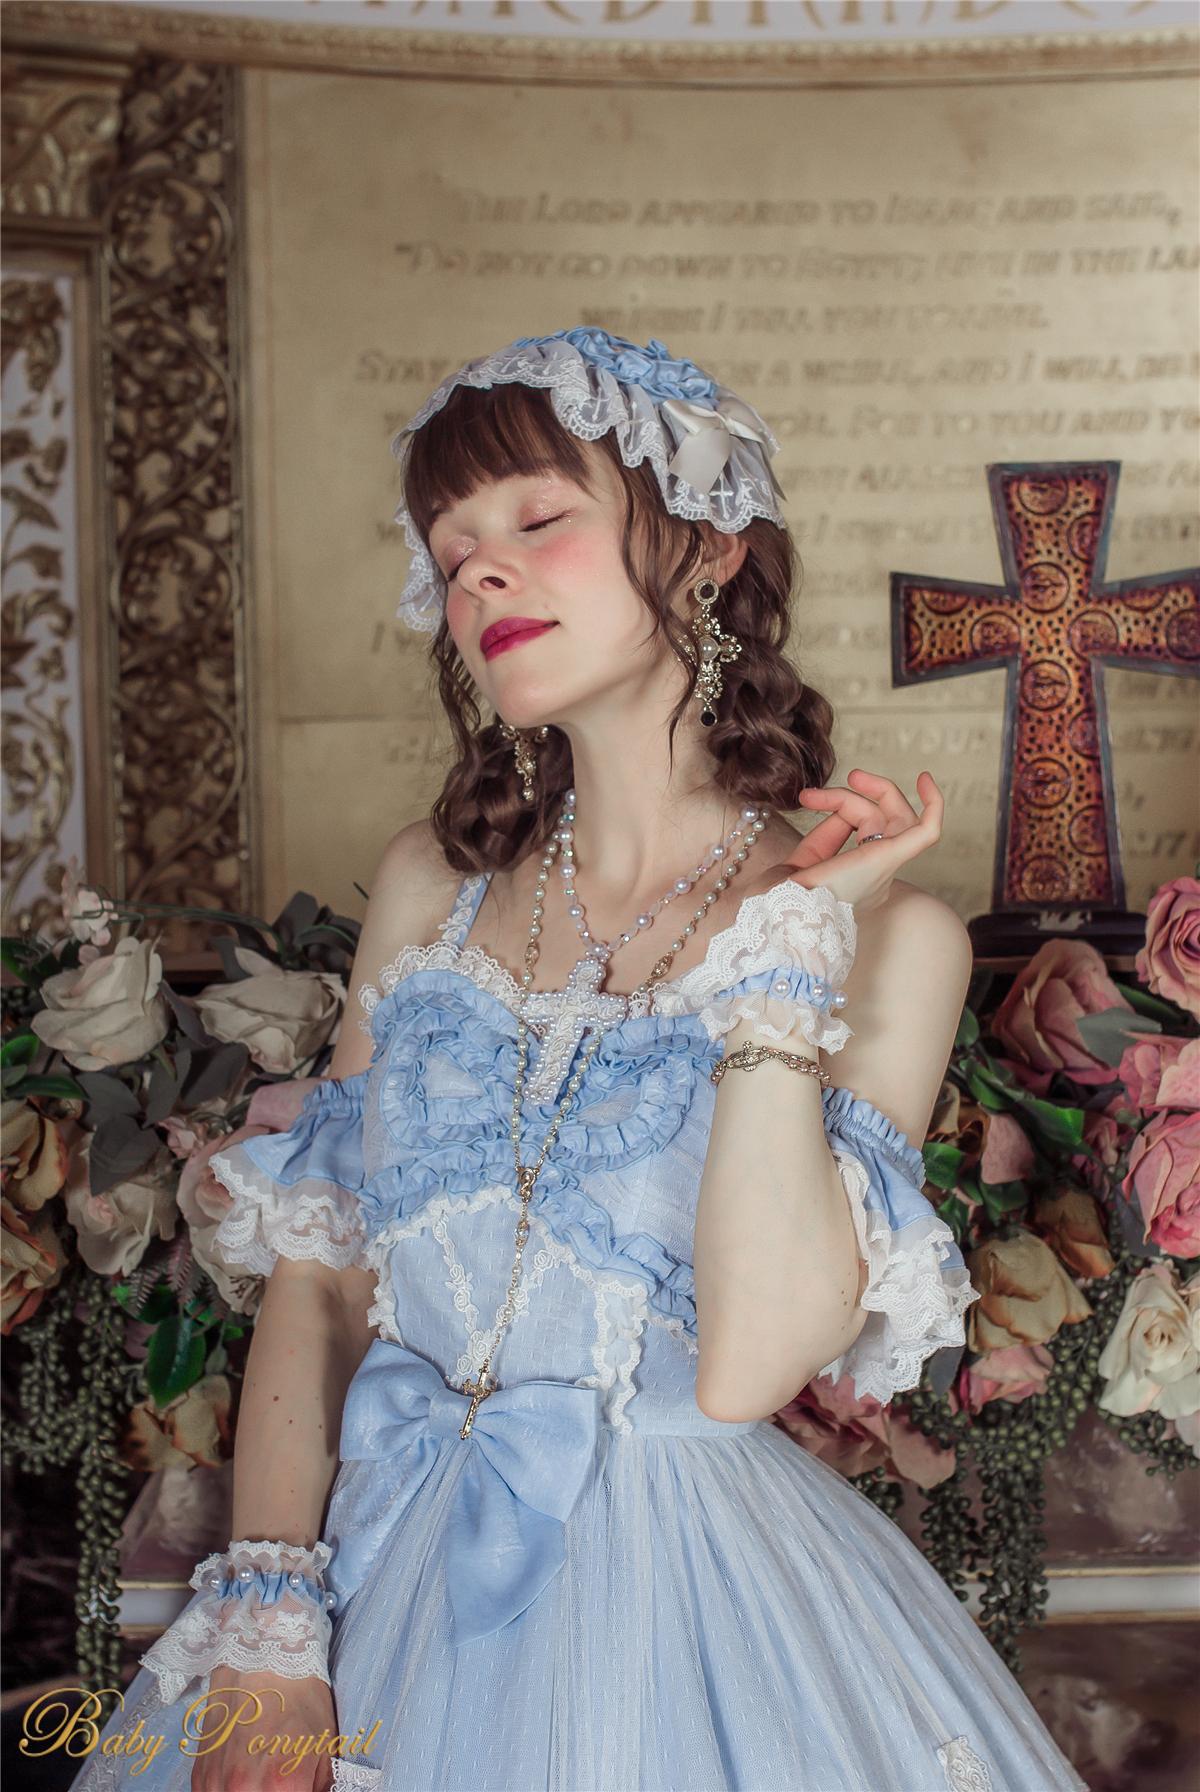 Babyponytail_Heavenly Teardrops_Model photo_JSK_Sax_Claudia_indoor_09.jpg